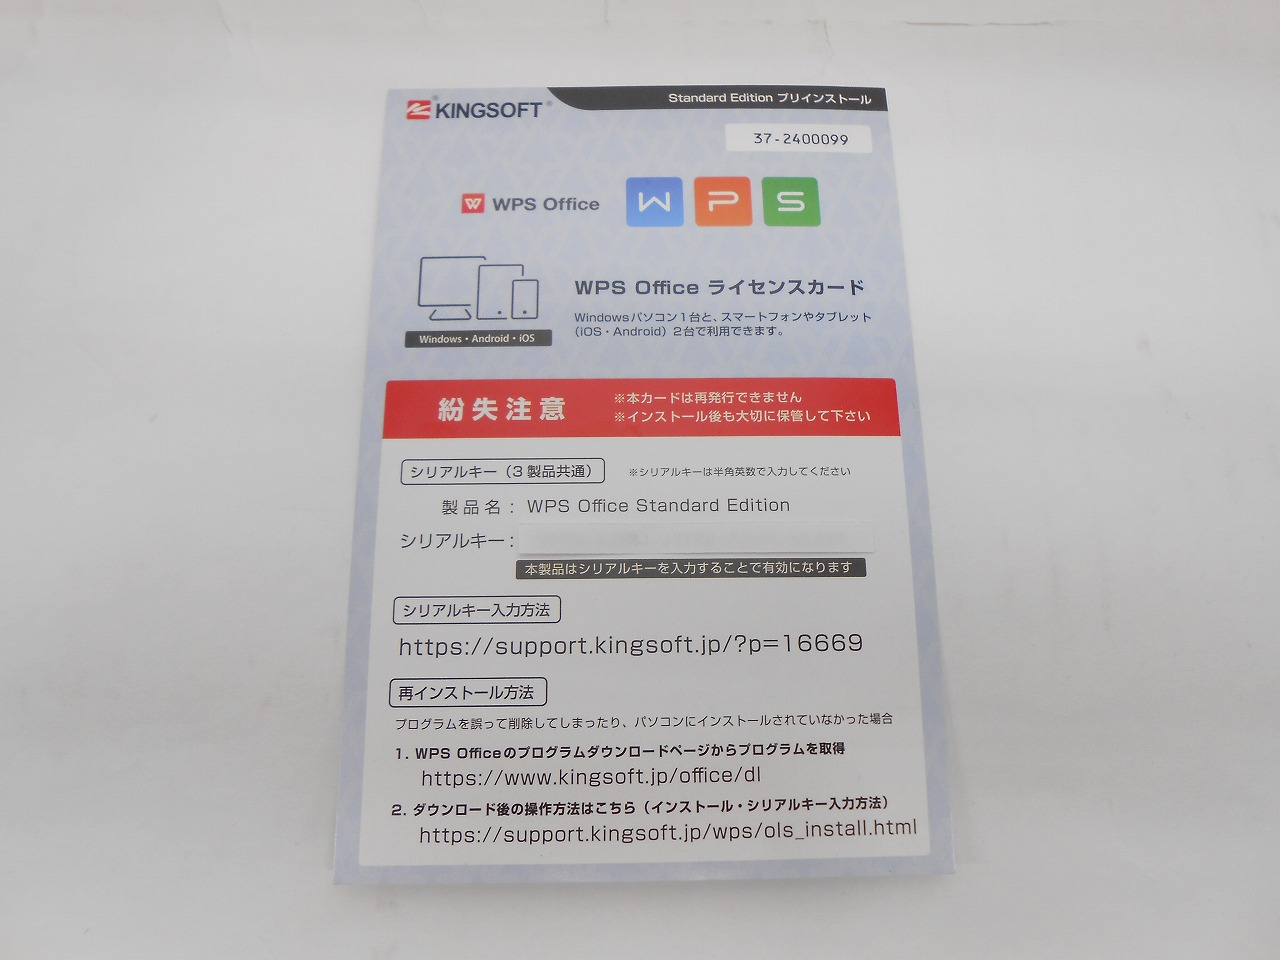 【SPRING SALE】【WPSOffice付】【中古】Panasonic Let'snote CF-SZ5/2015年モデル/Corei3 6100U 2.3GHz/メモリ4GB/SSD240GB/12インチ/Windows10Pro【3ヶ月保証】【足立店発送】